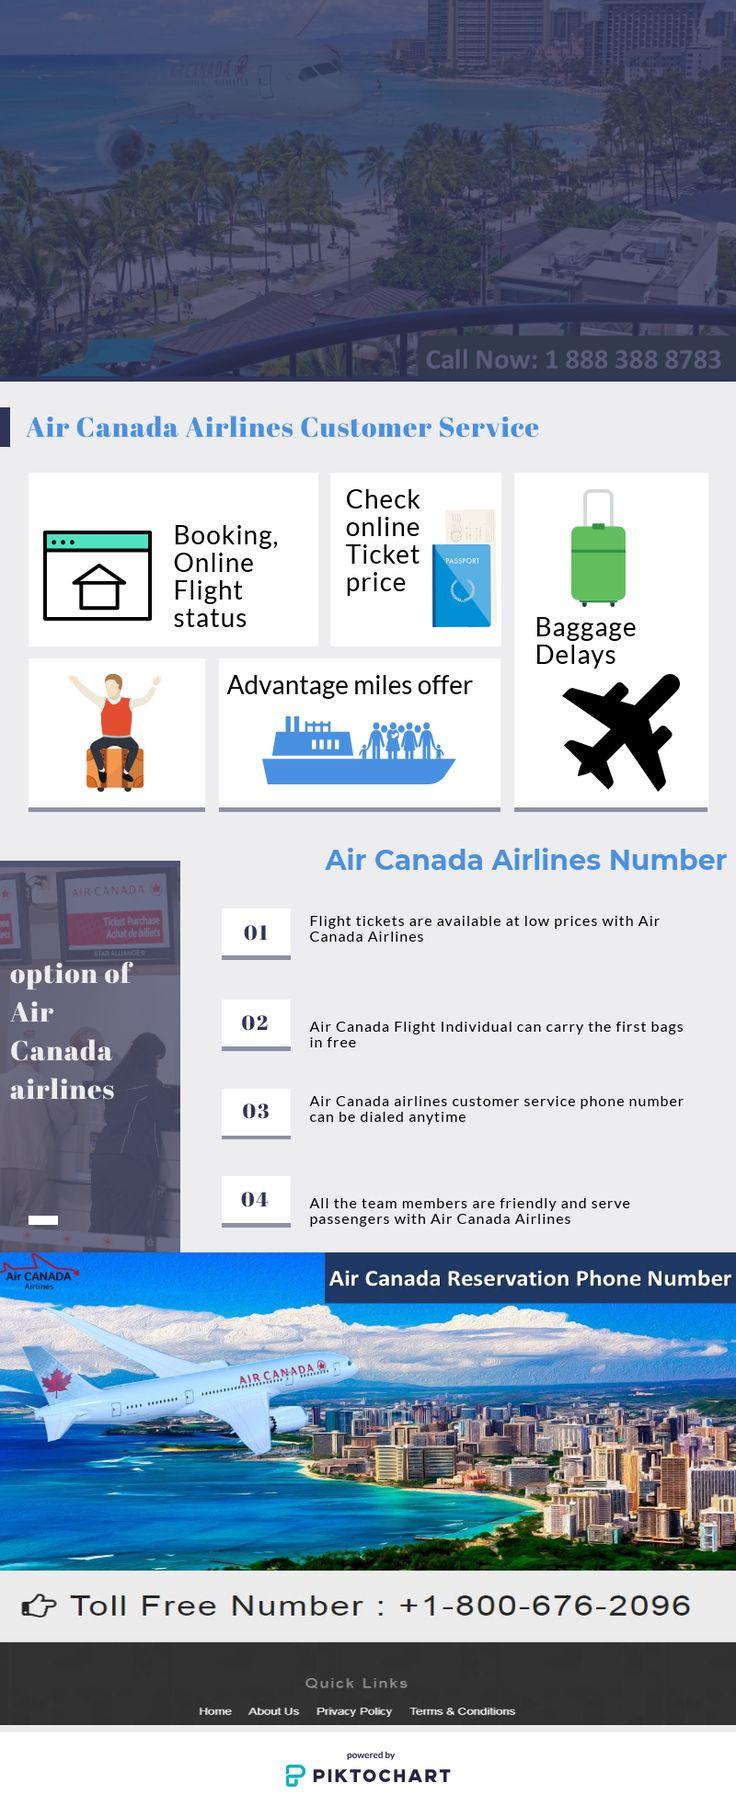 Contact us at Air Canada airlines flight status Phone